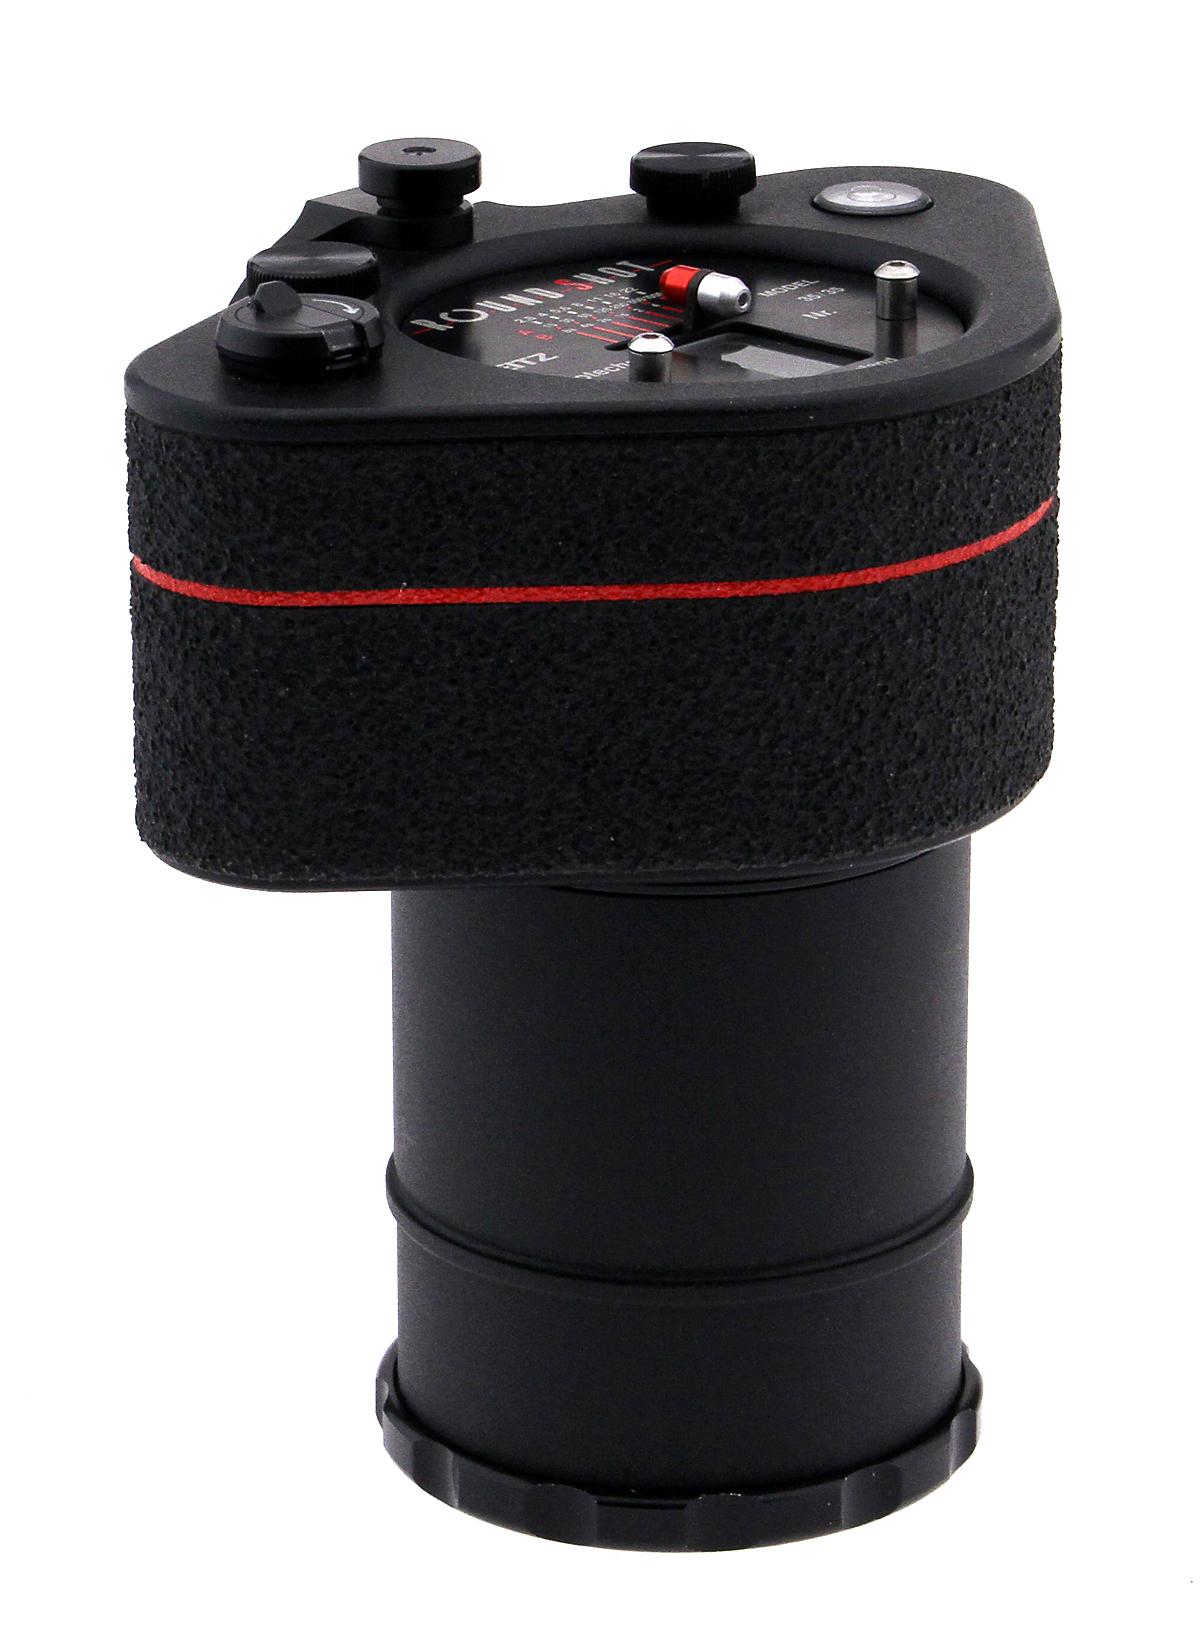 Roundshot Model 35/35 Panoramic Camera Used